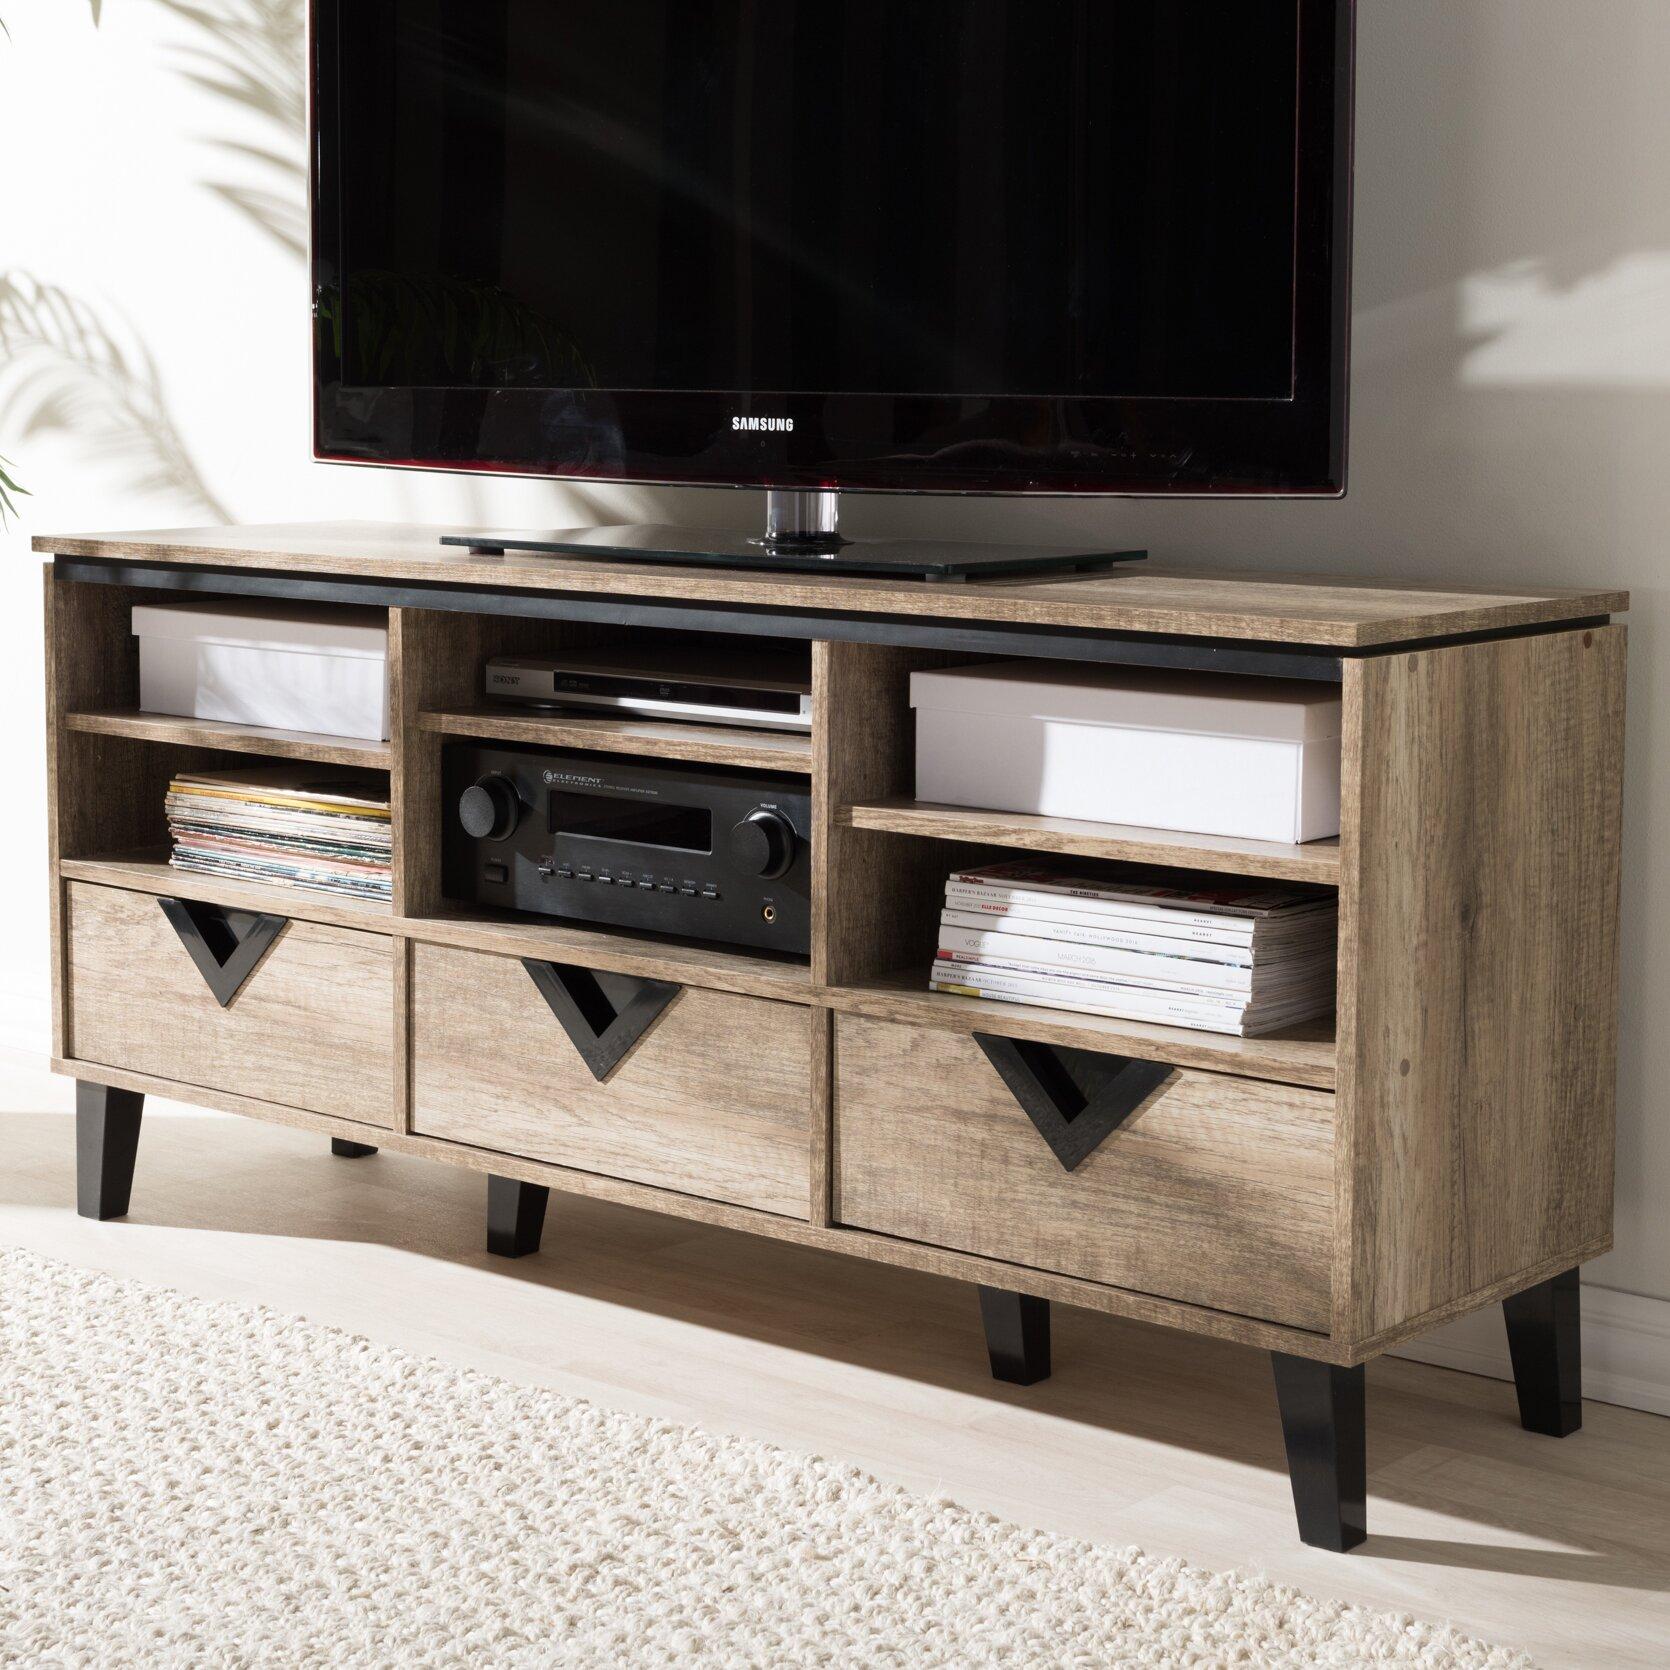 Wholesale interiors baxton studio tv stand reviews wayfair for Baxton studio